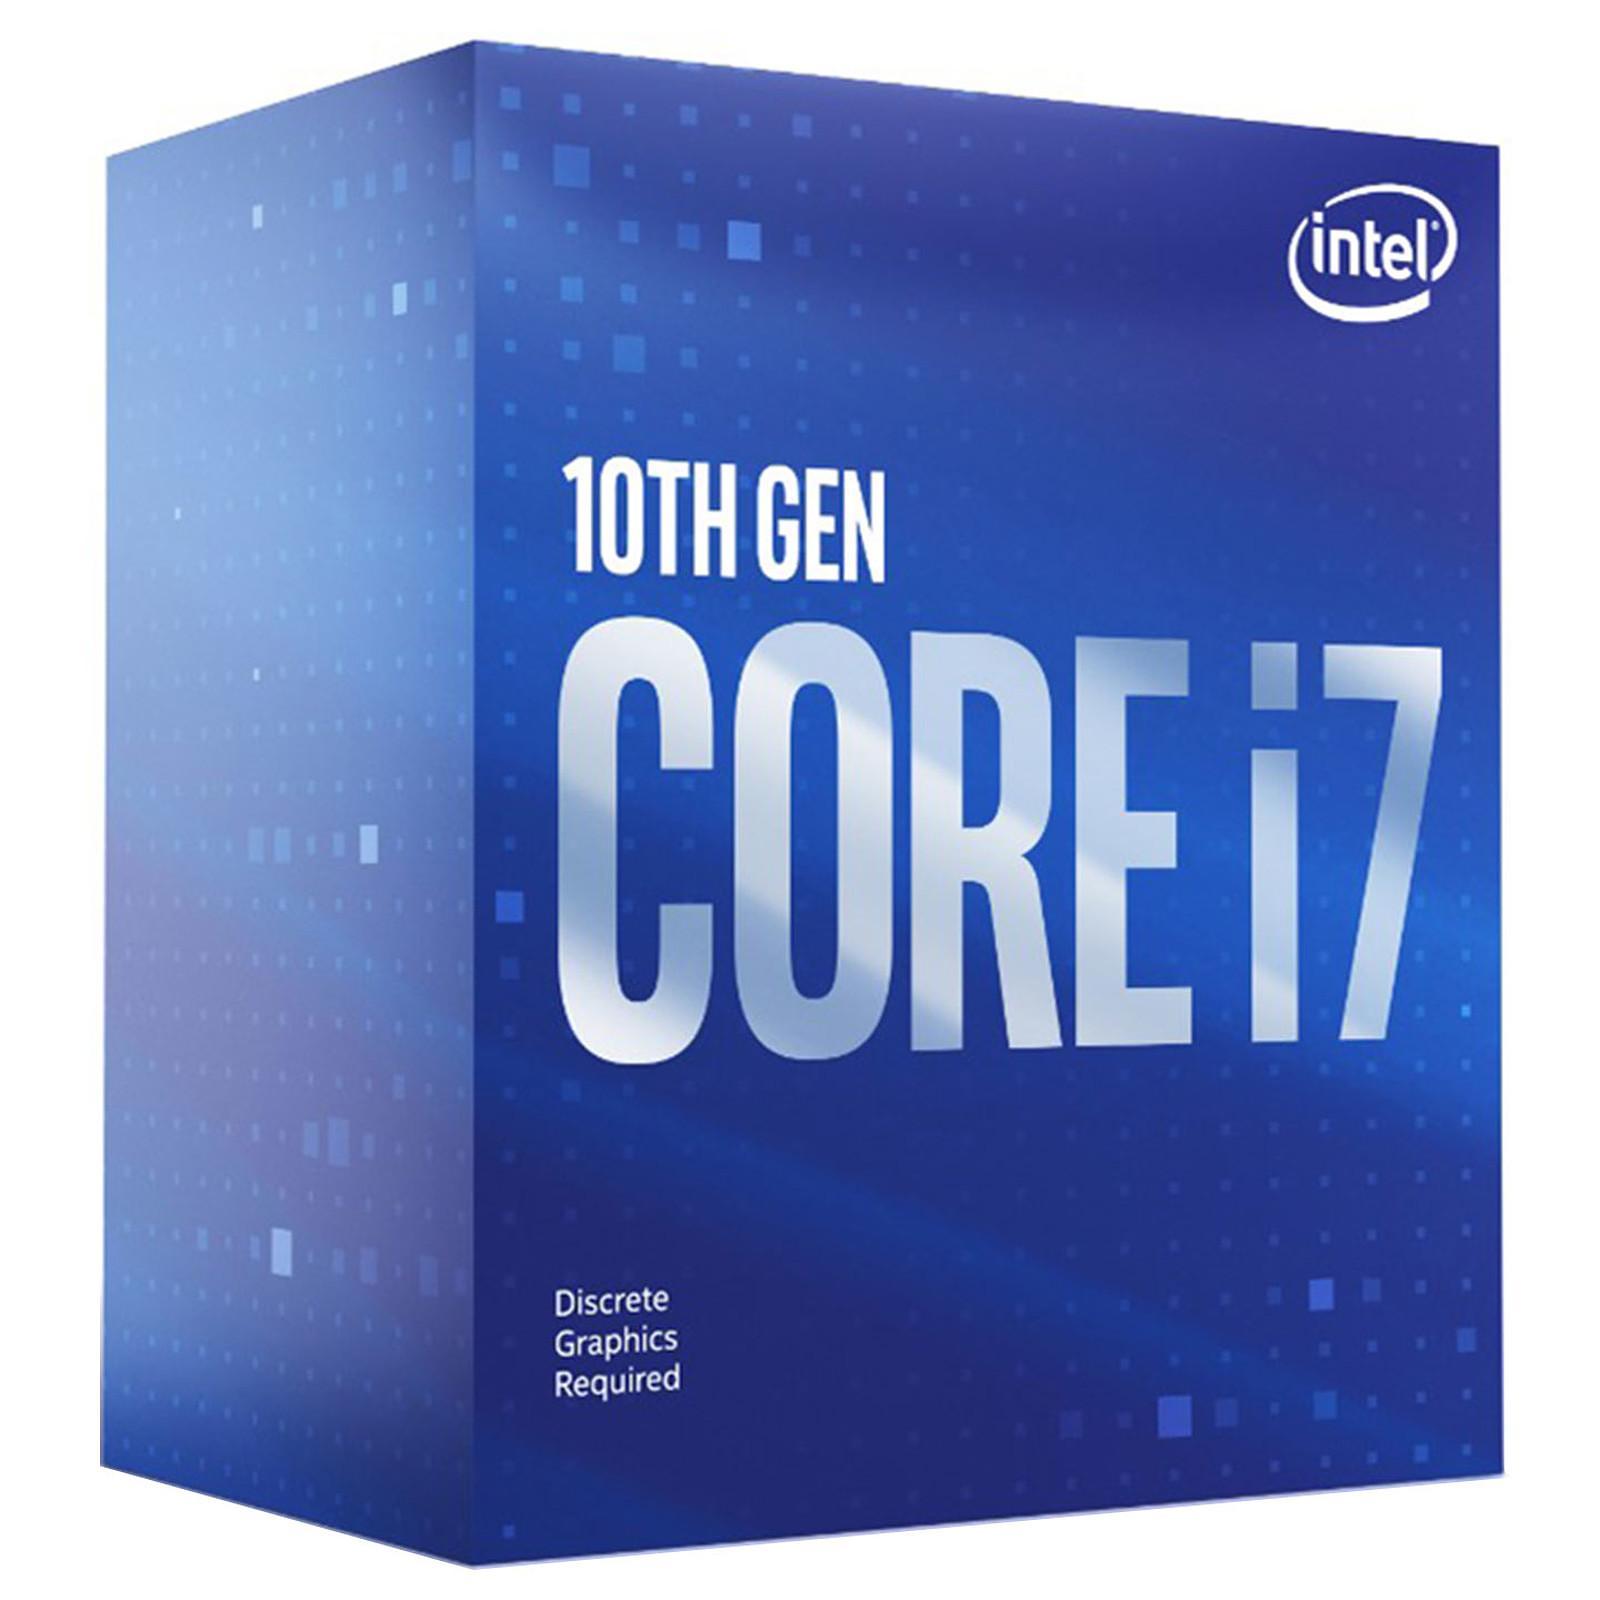 Intel Core i7-10700F (2.9 GHz / 4.8 GHz)